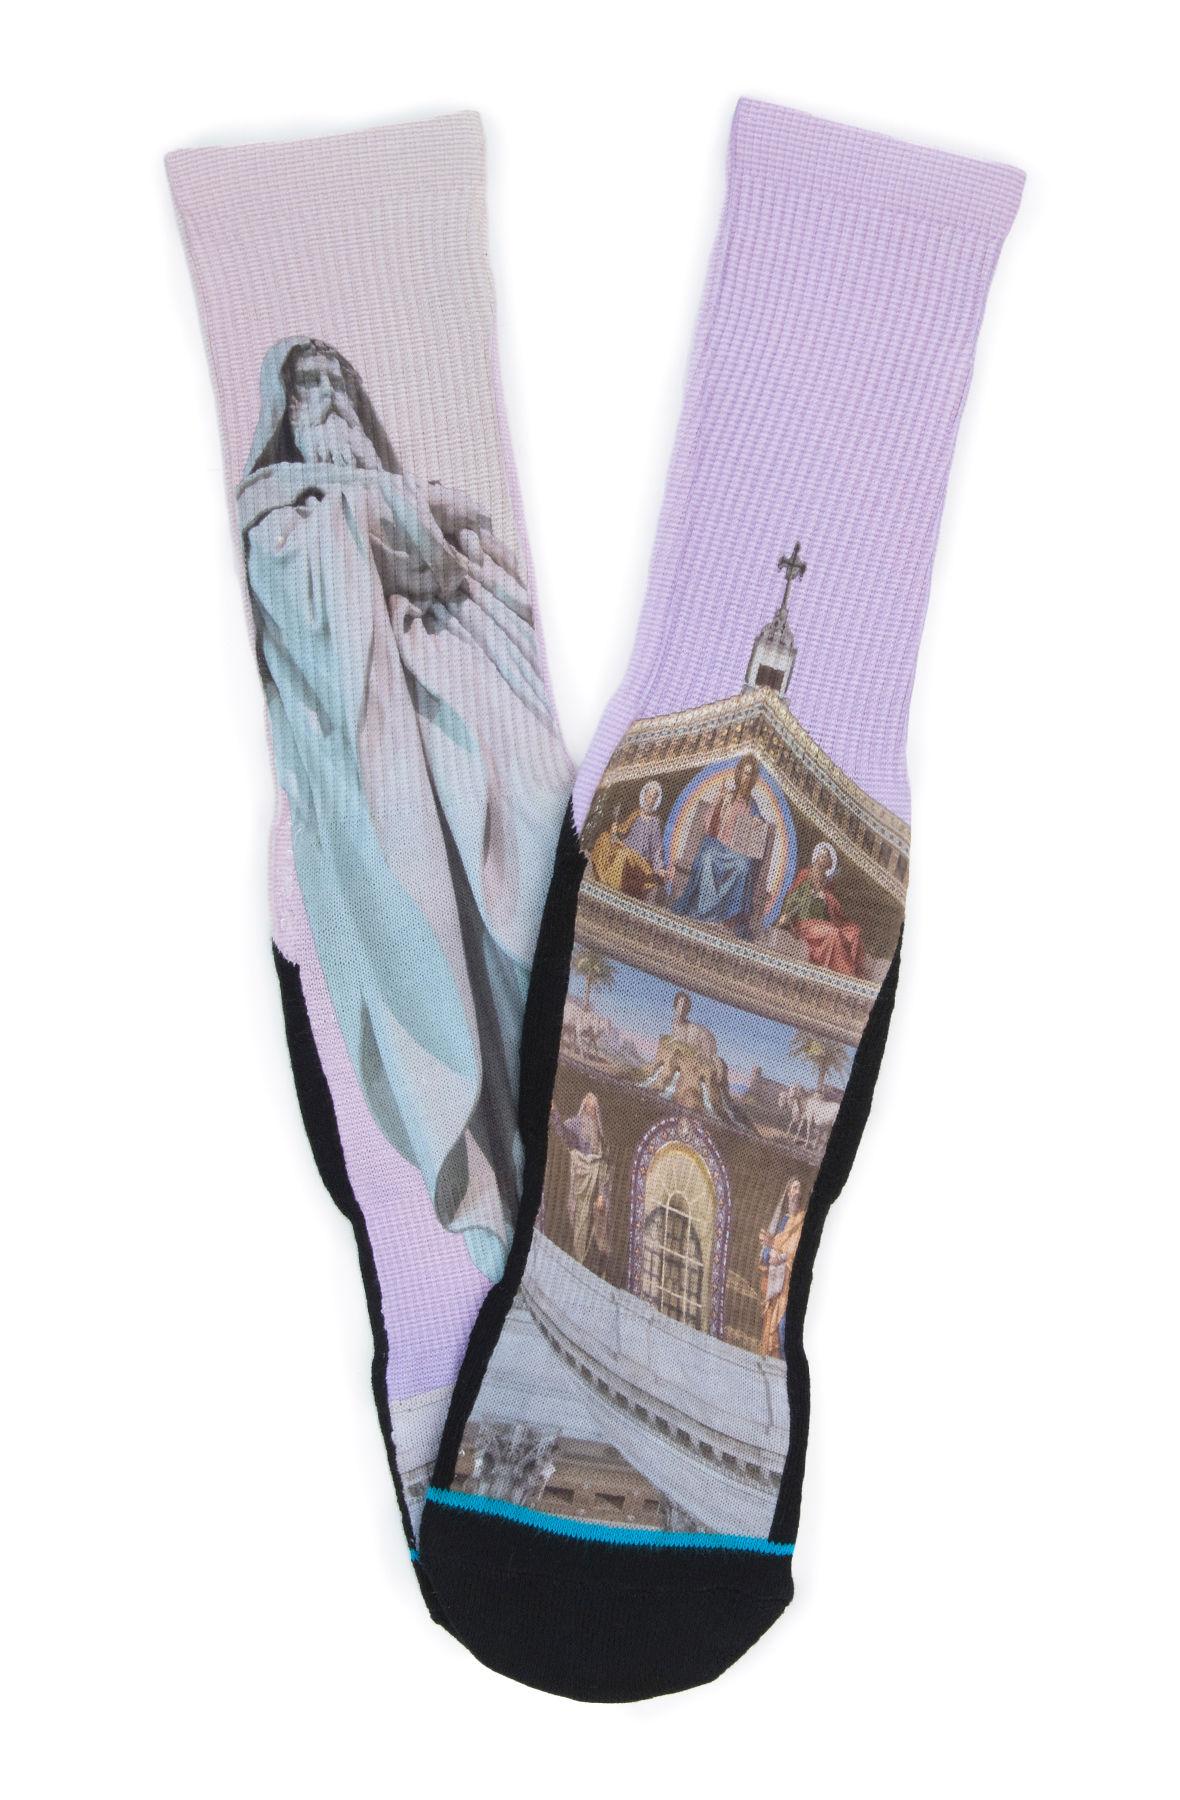 The St. Paul Socks in Multiple Colors